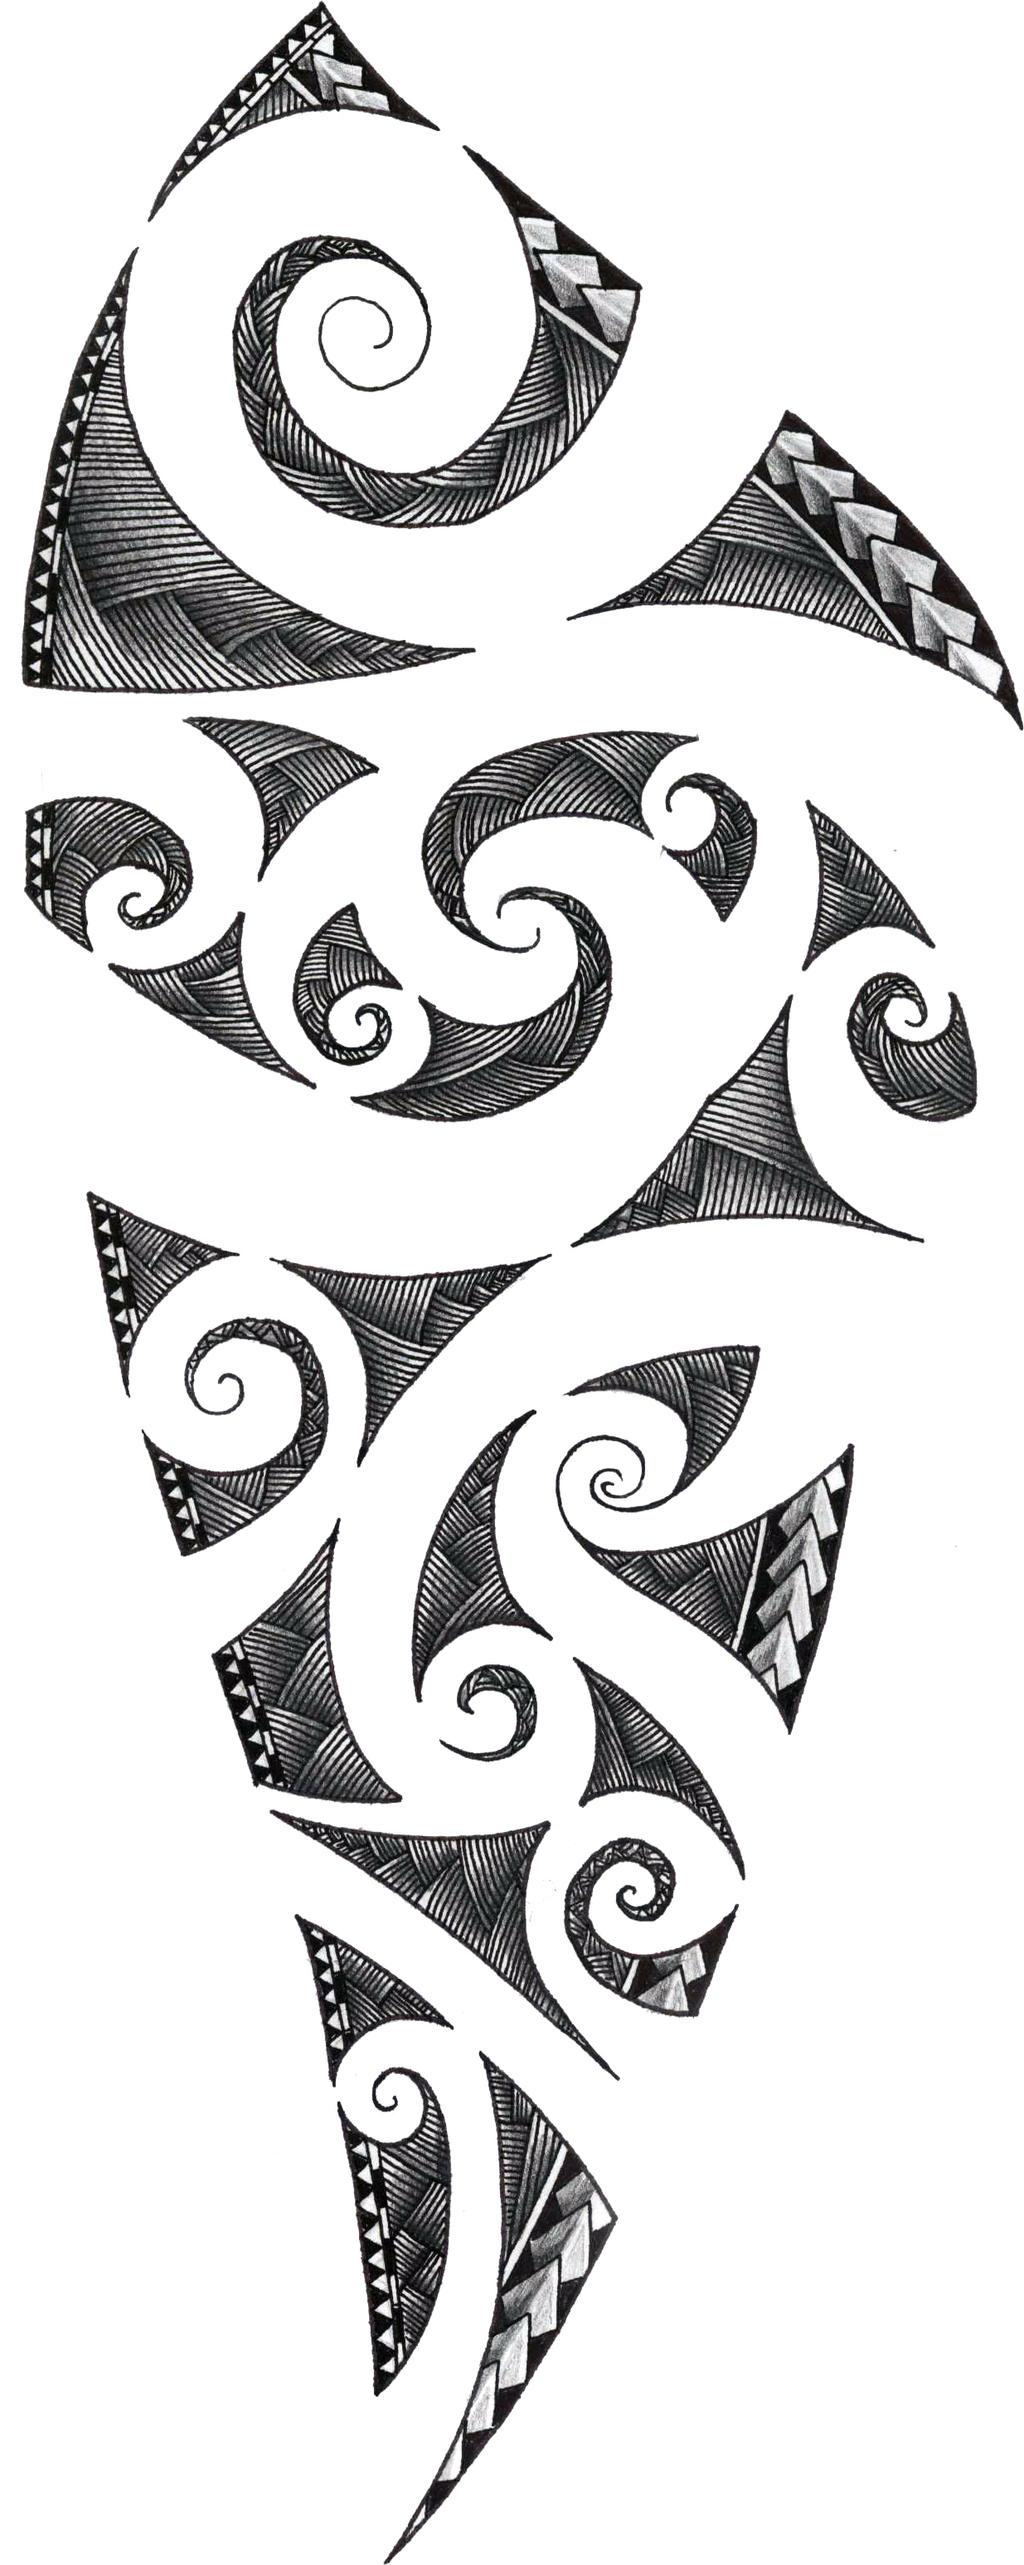 maori tattoo design by zakonkrancaswiata on deviantart. Black Bedroom Furniture Sets. Home Design Ideas